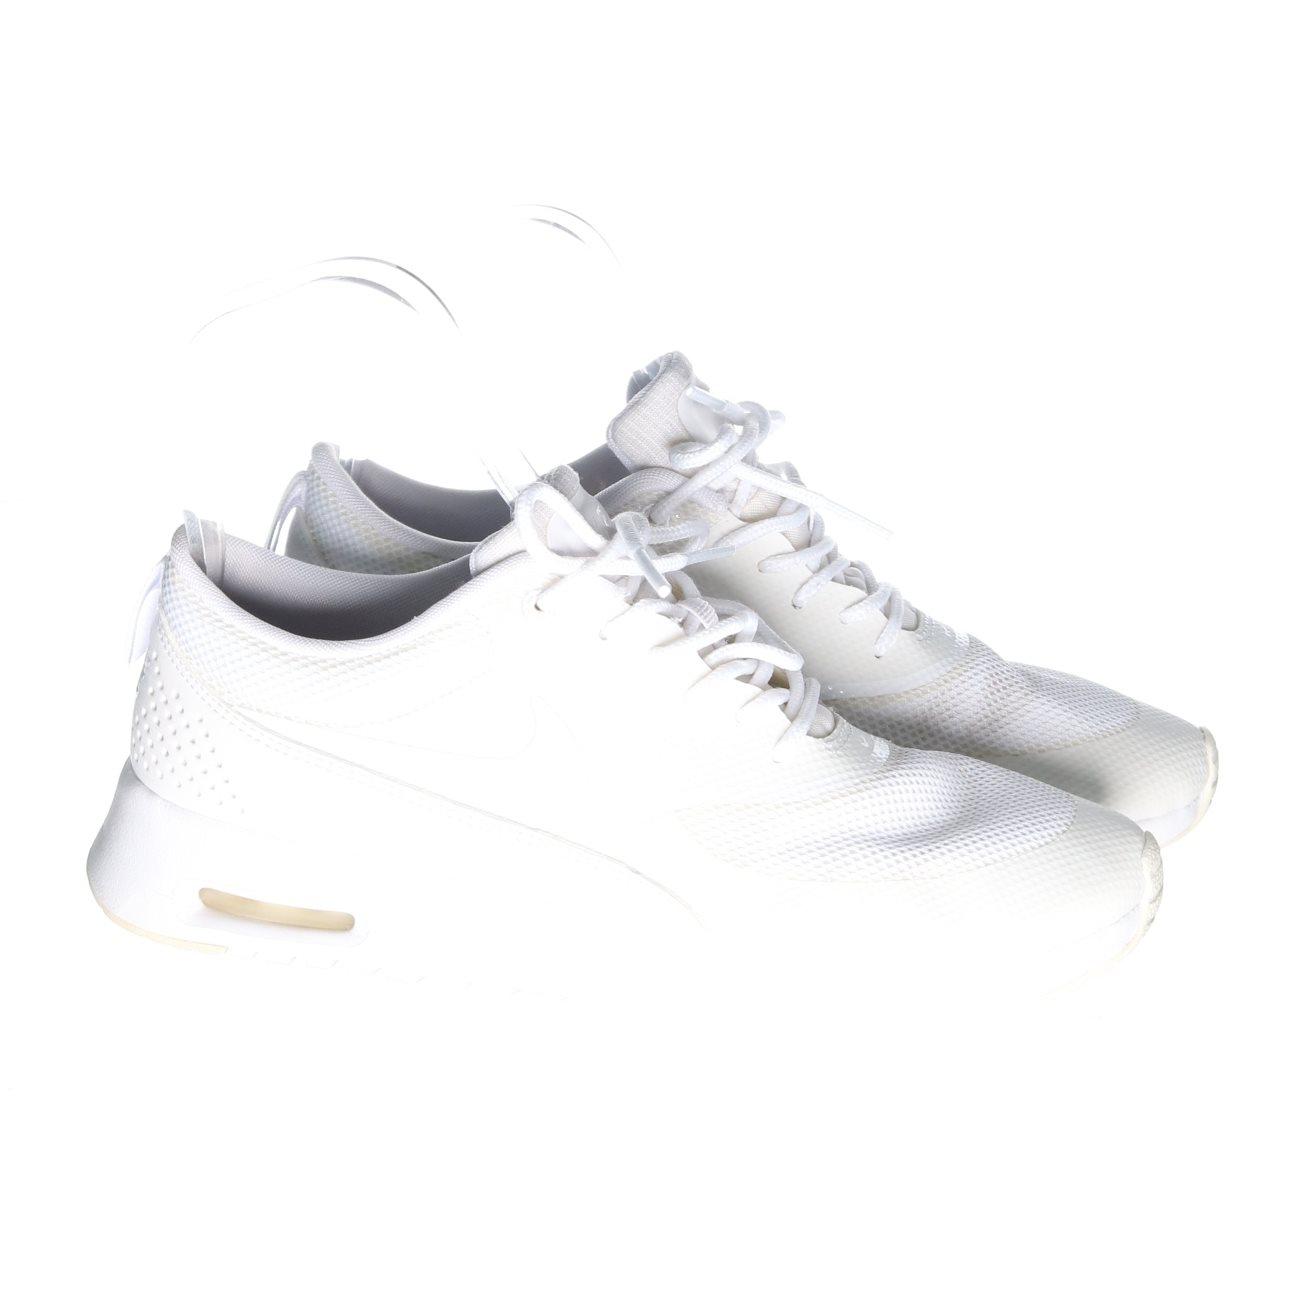 on sale 37258 386fd Nike, Sneakers, Air Max Thea, Strl 40, Vit ...